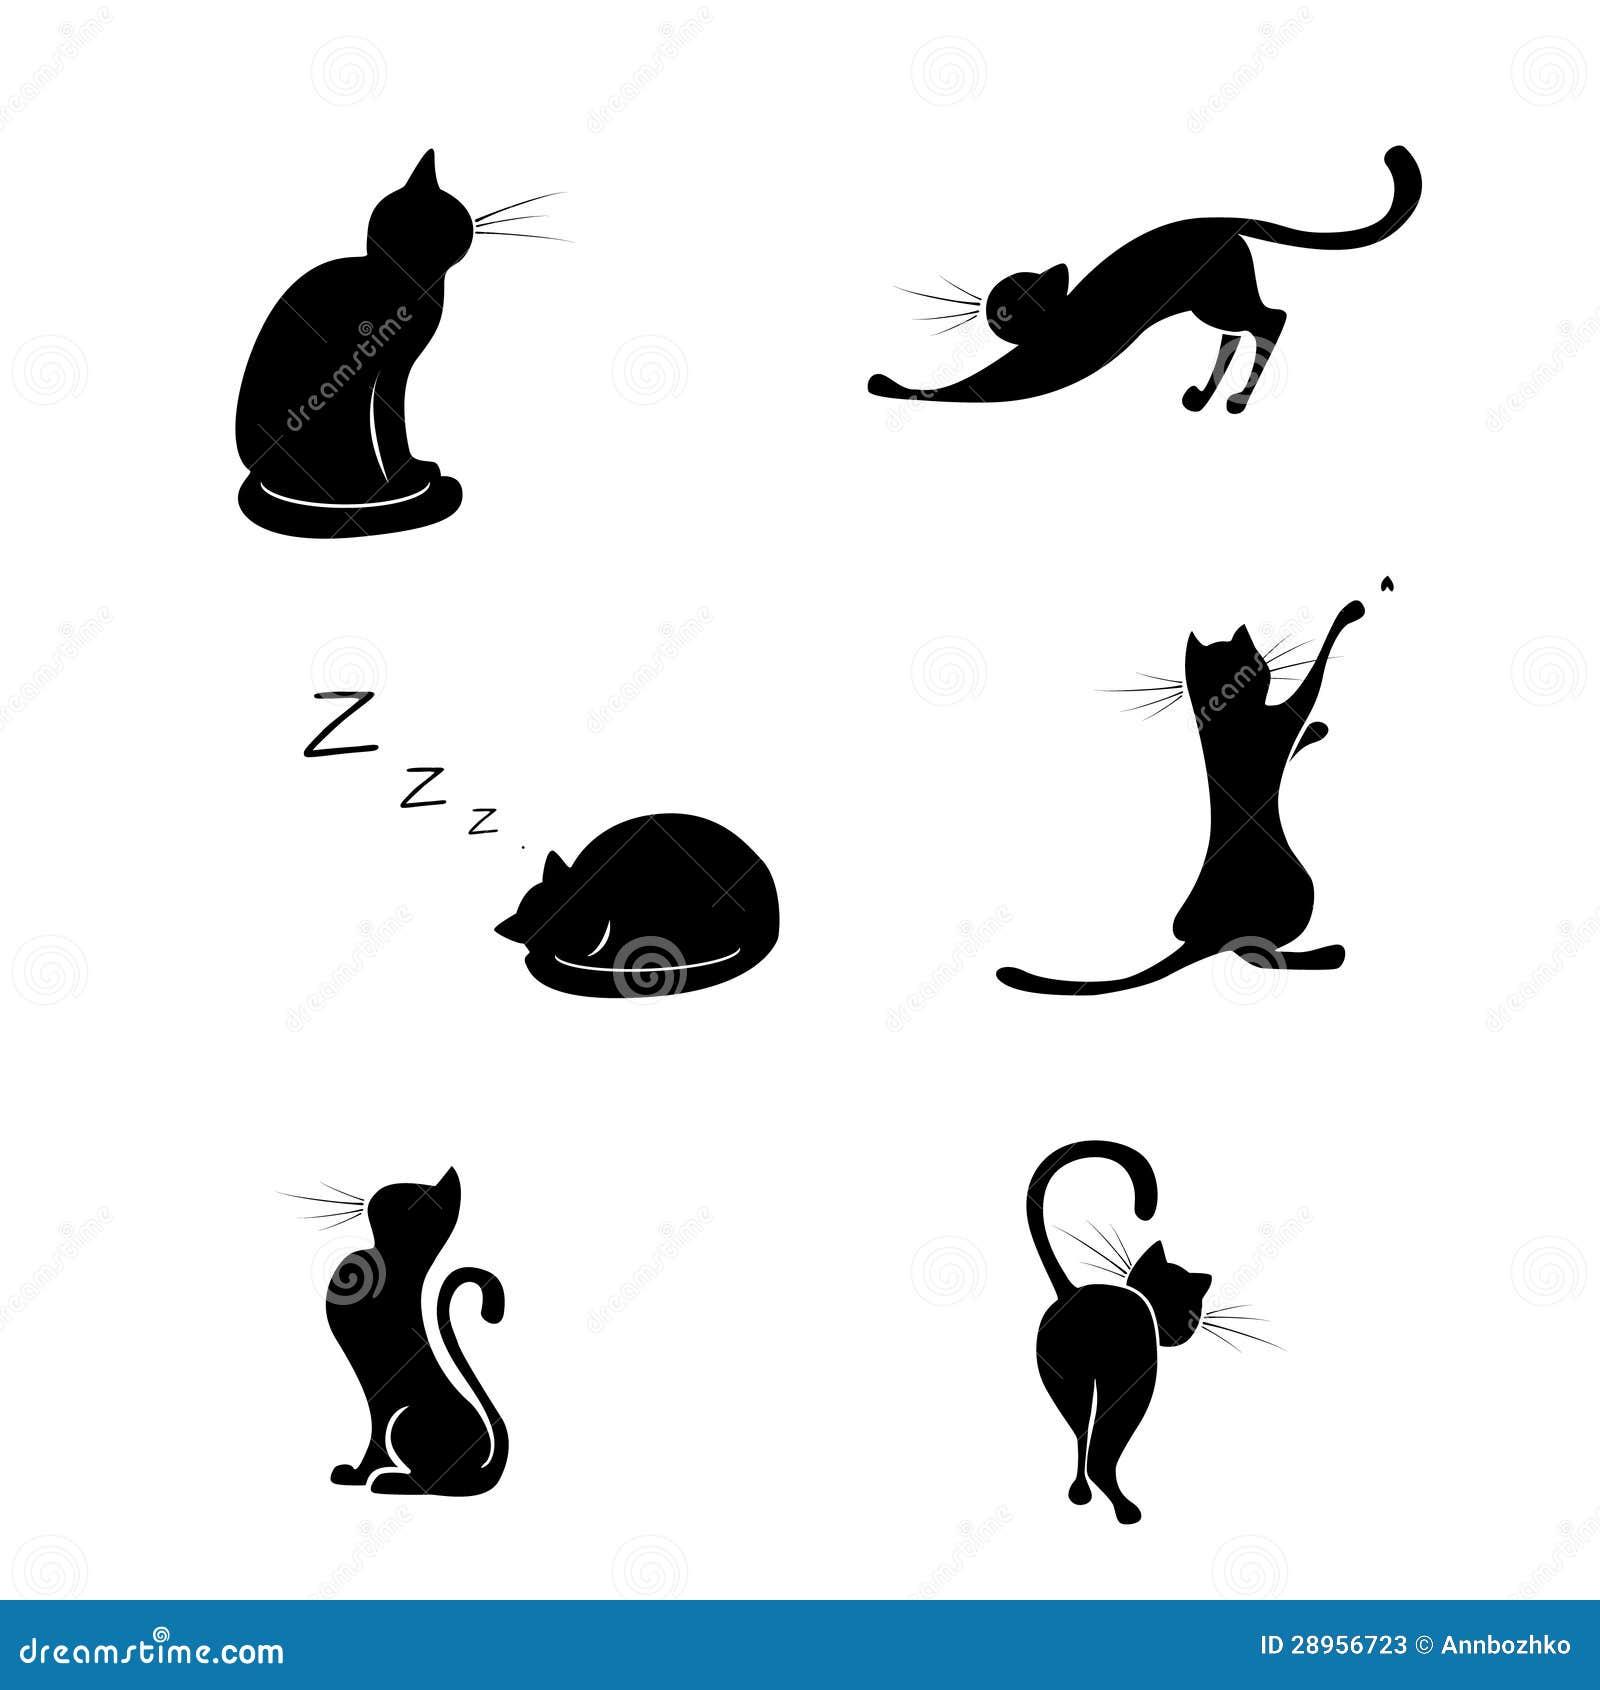 silueta de gato negro - photo #17